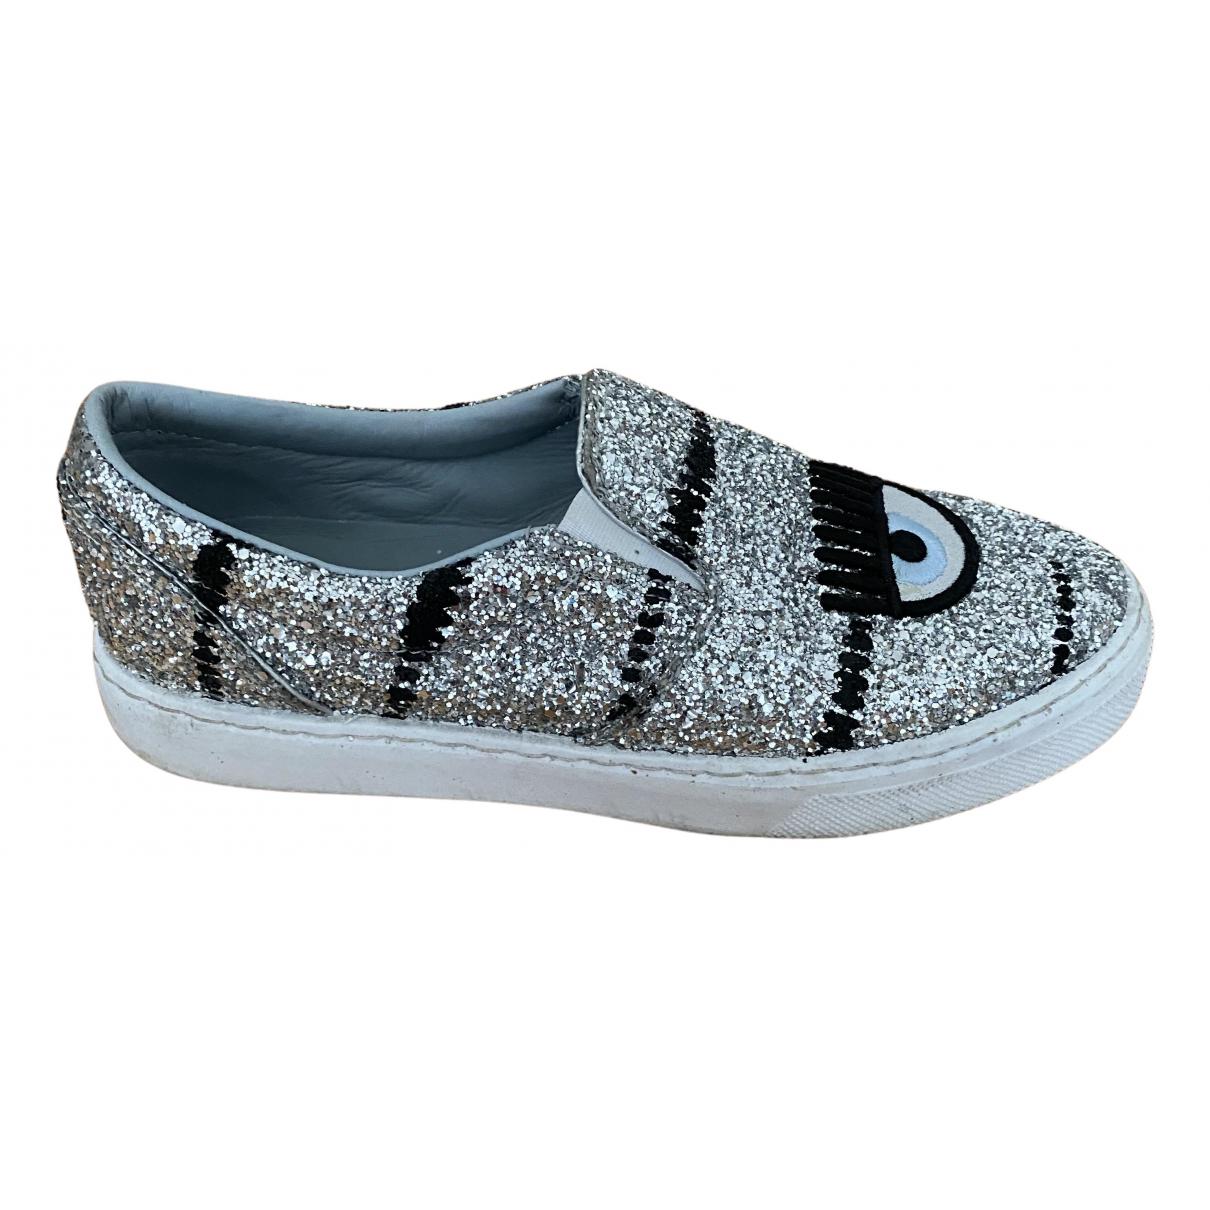 Chiara Ferragni \N Sneakers in  Silber Polyester